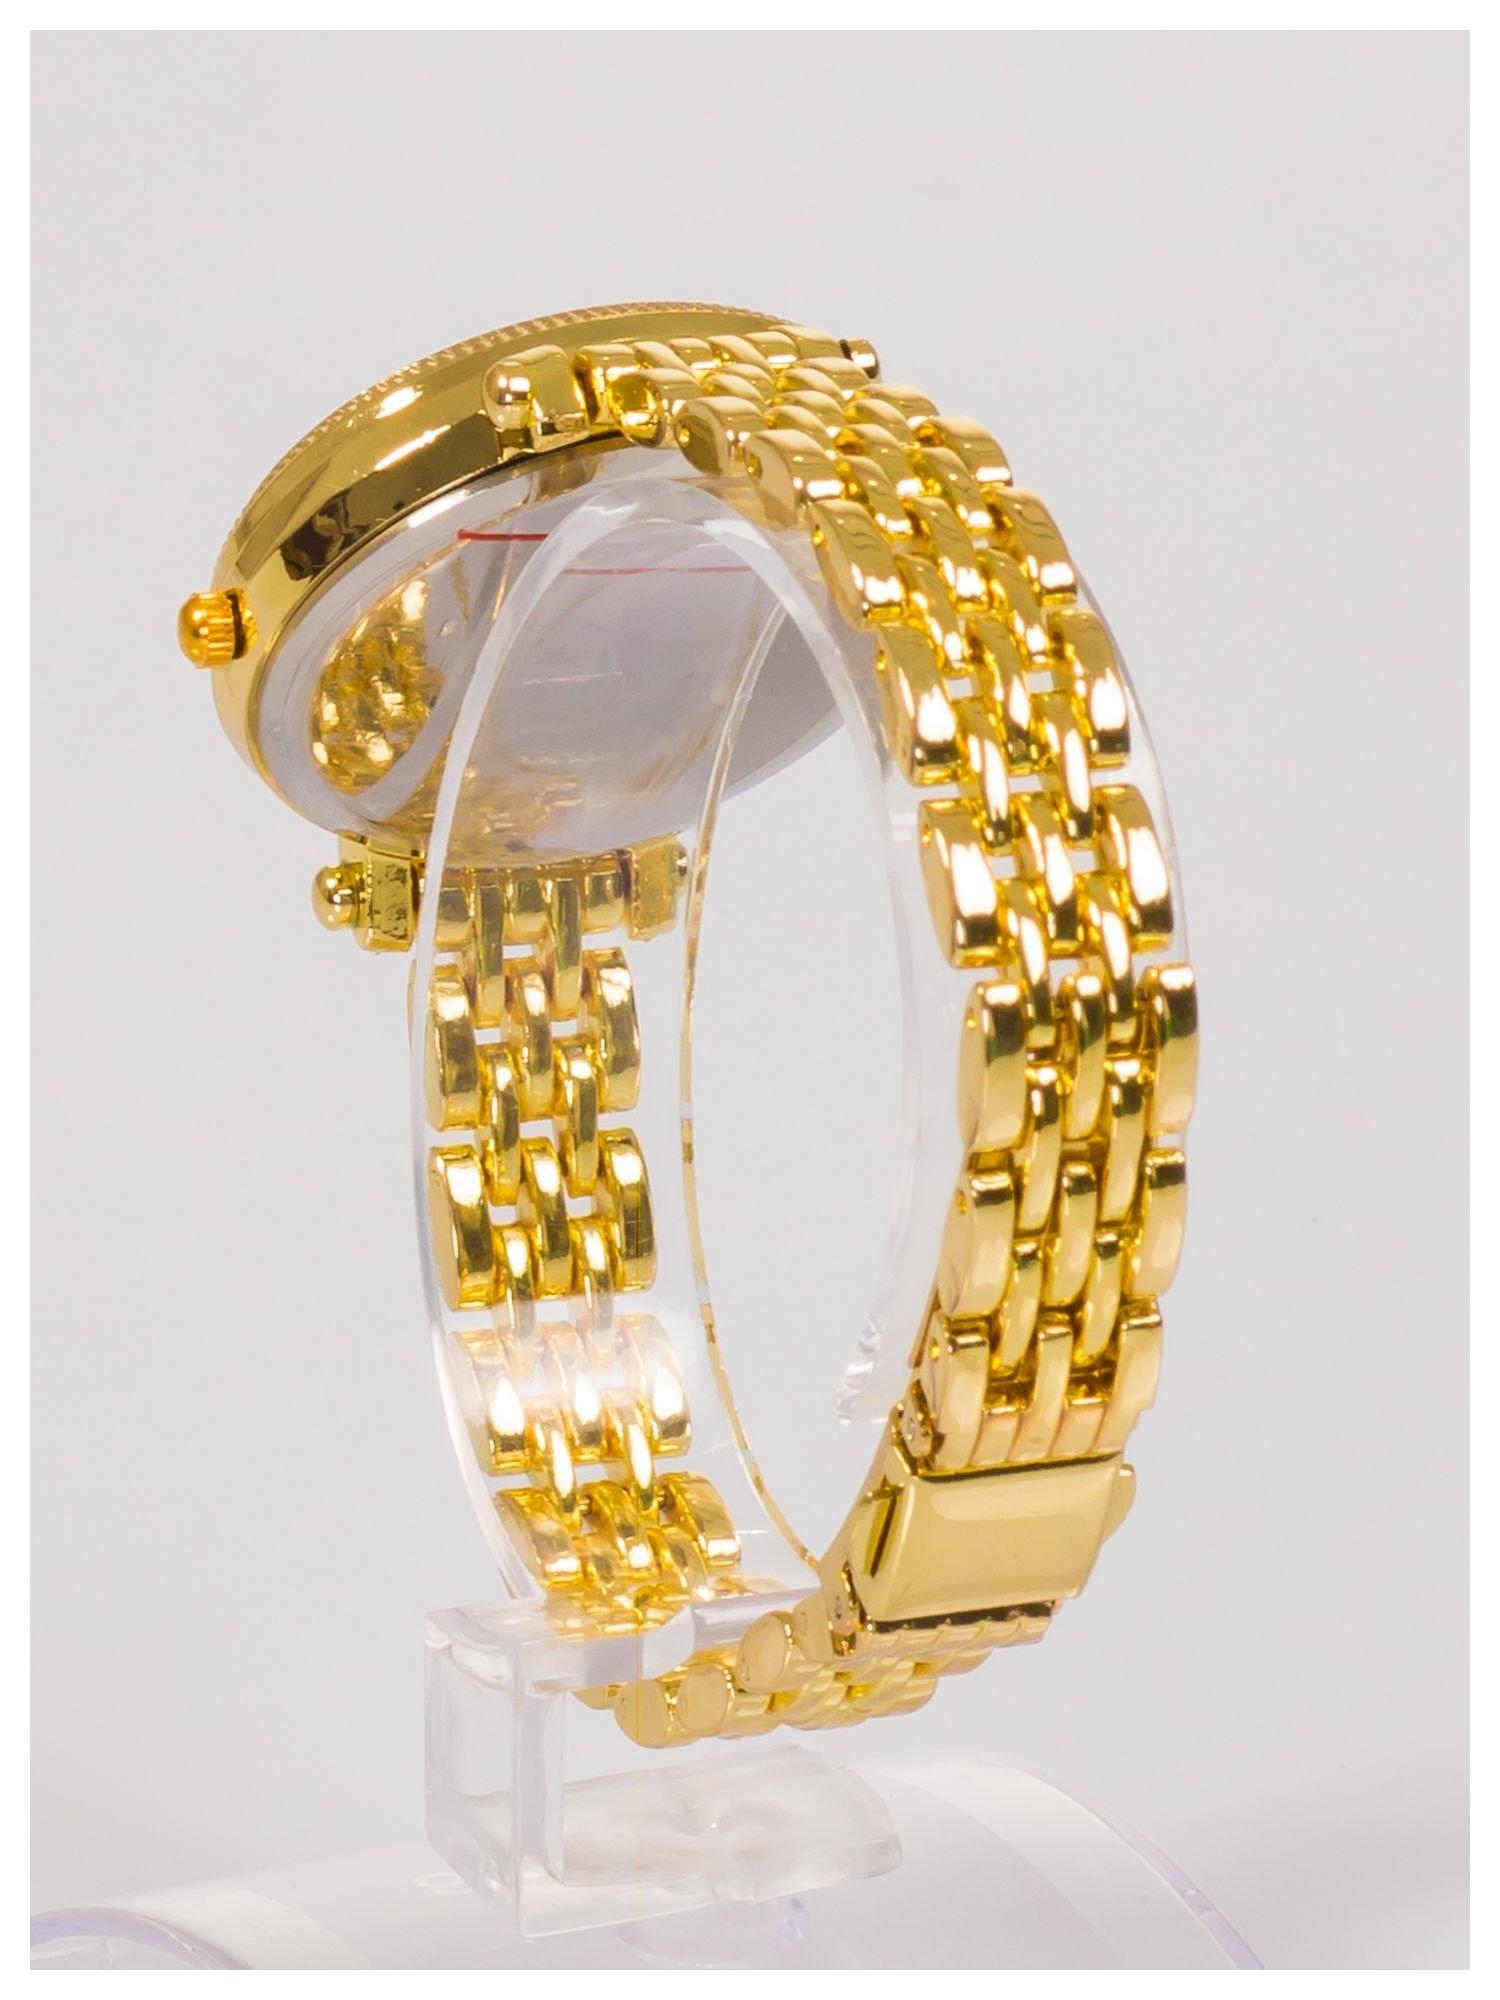 GENEVA Złoty zegarek damski                                  zdj.                                  3